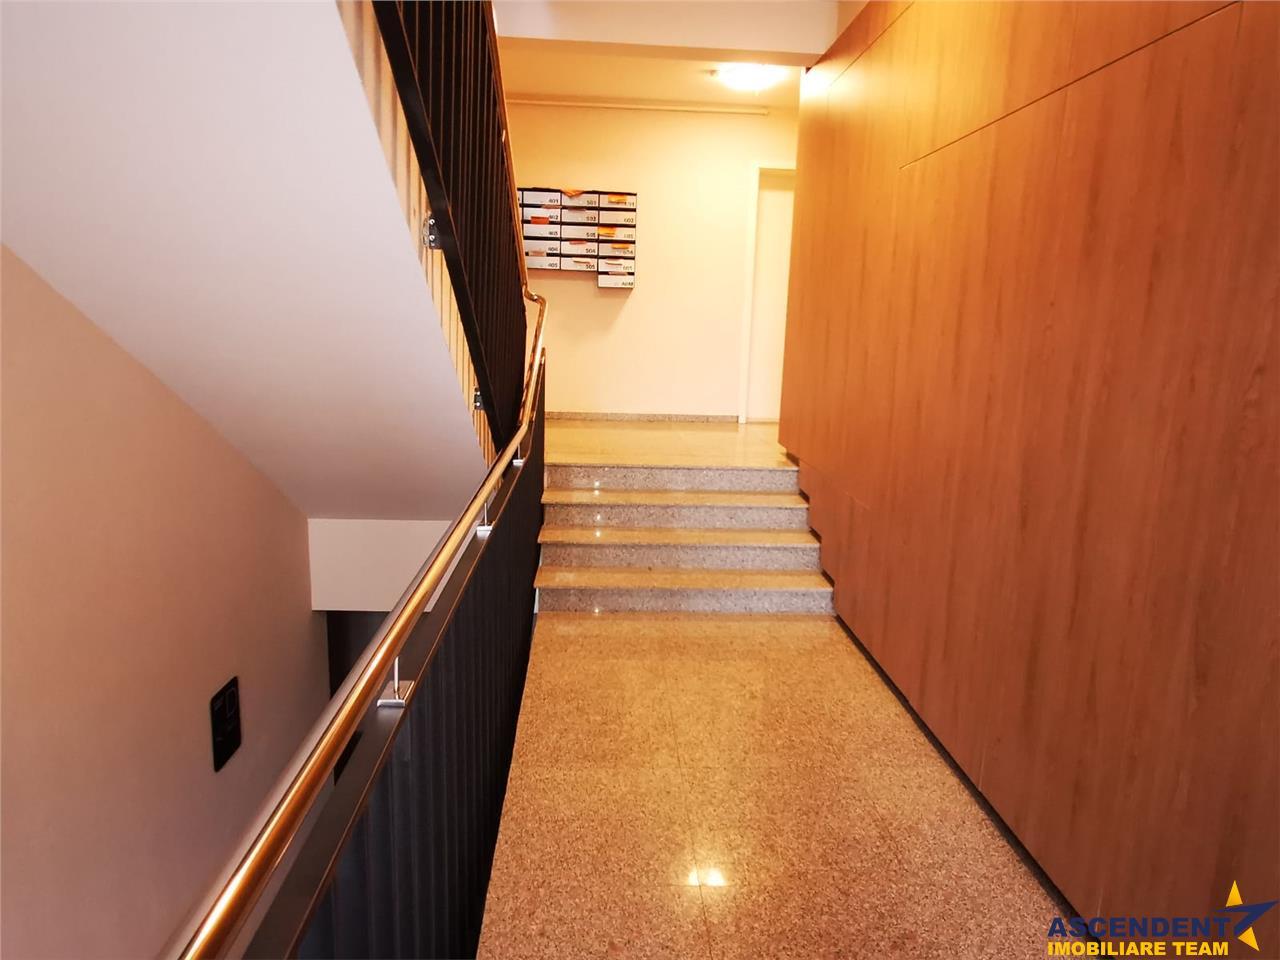 Proprietate in zona rezidentiala Coresi, recomandabila zonare, birou sau rezidenta